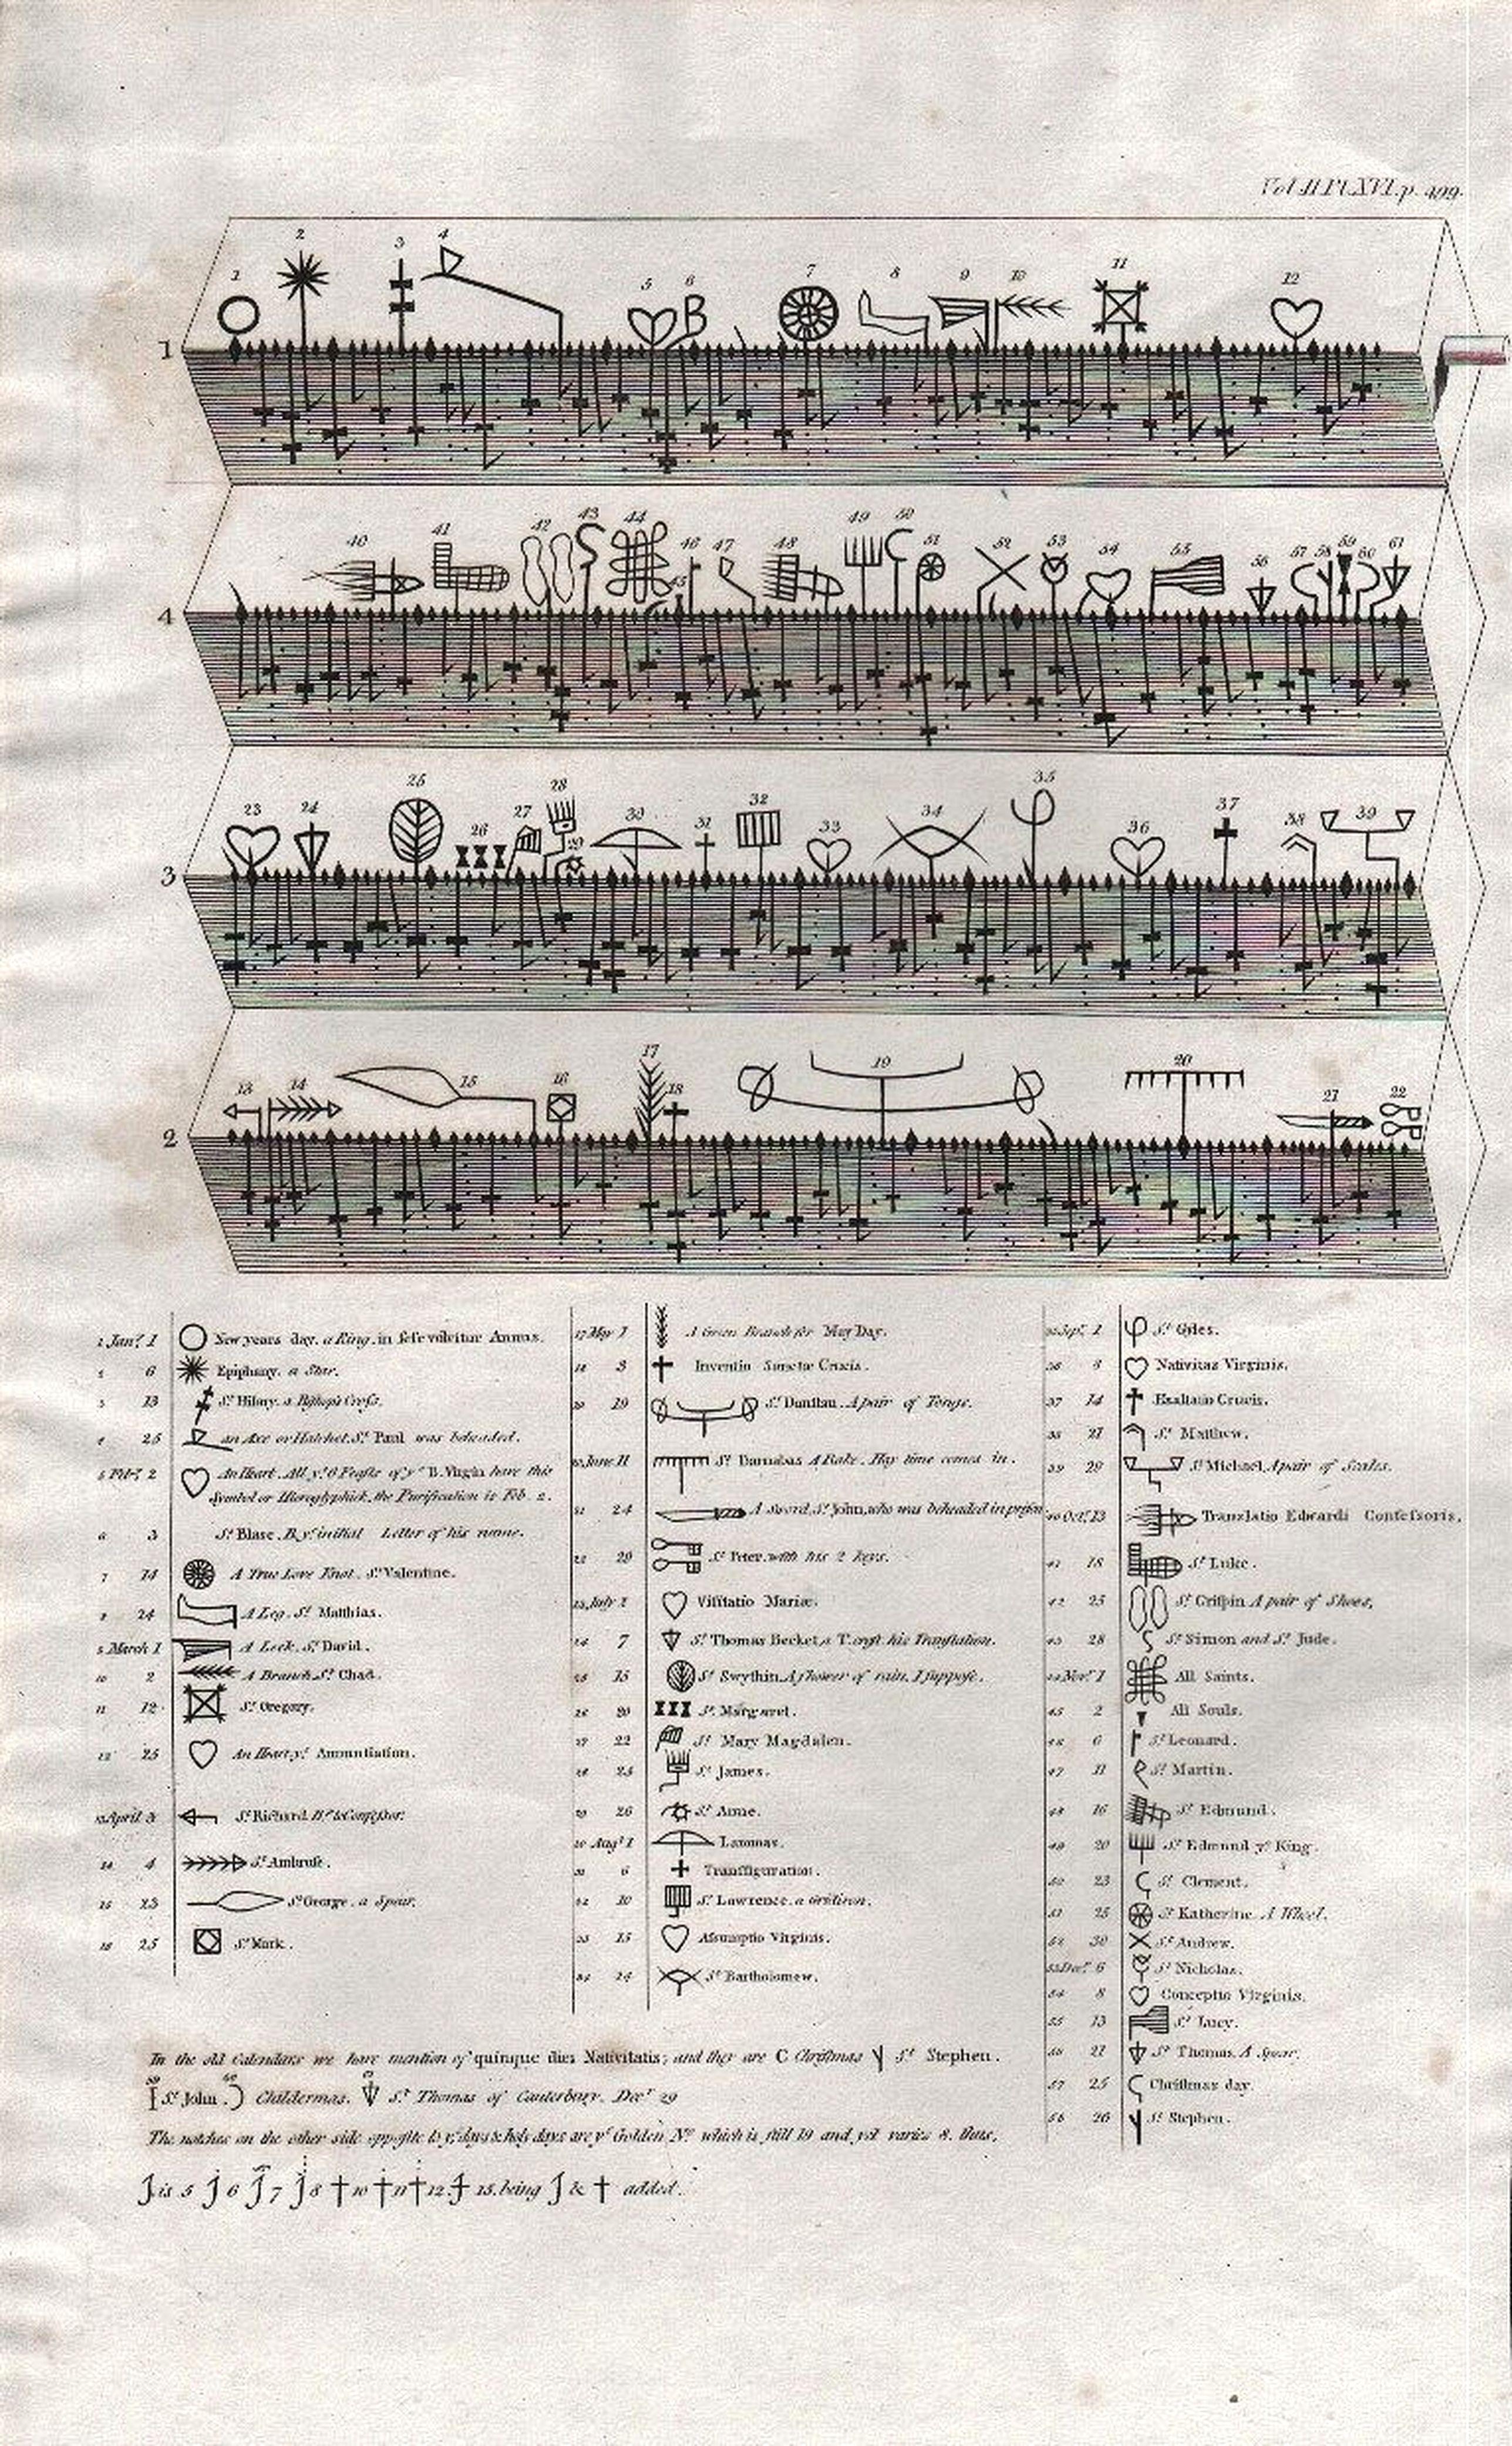 Richard Gough / John Cary.  - Clog Almanac.